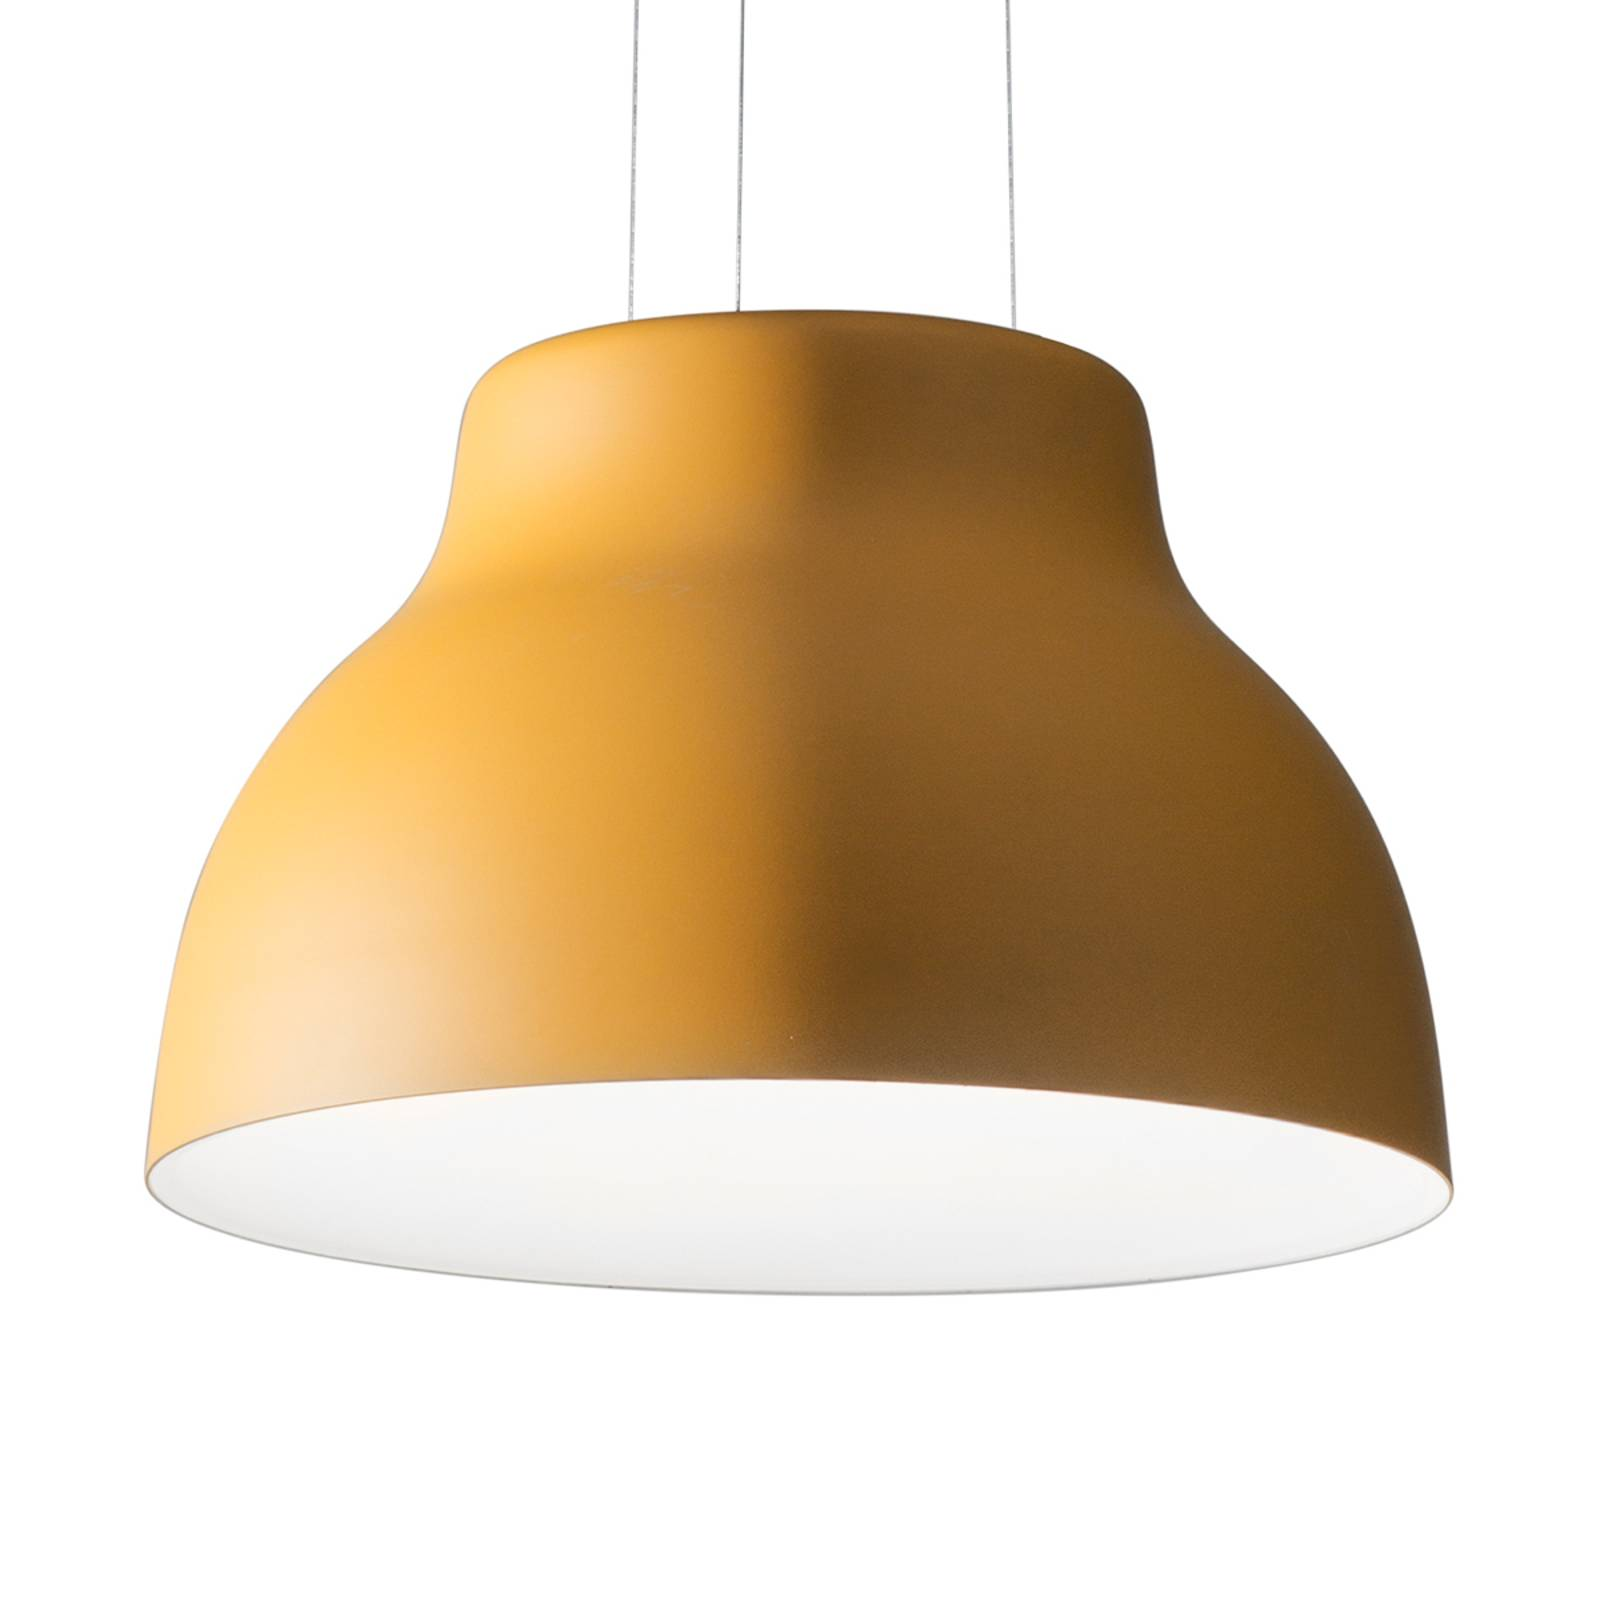 Martinelli Luce Cicala -LED-riippuvalo, keltainen